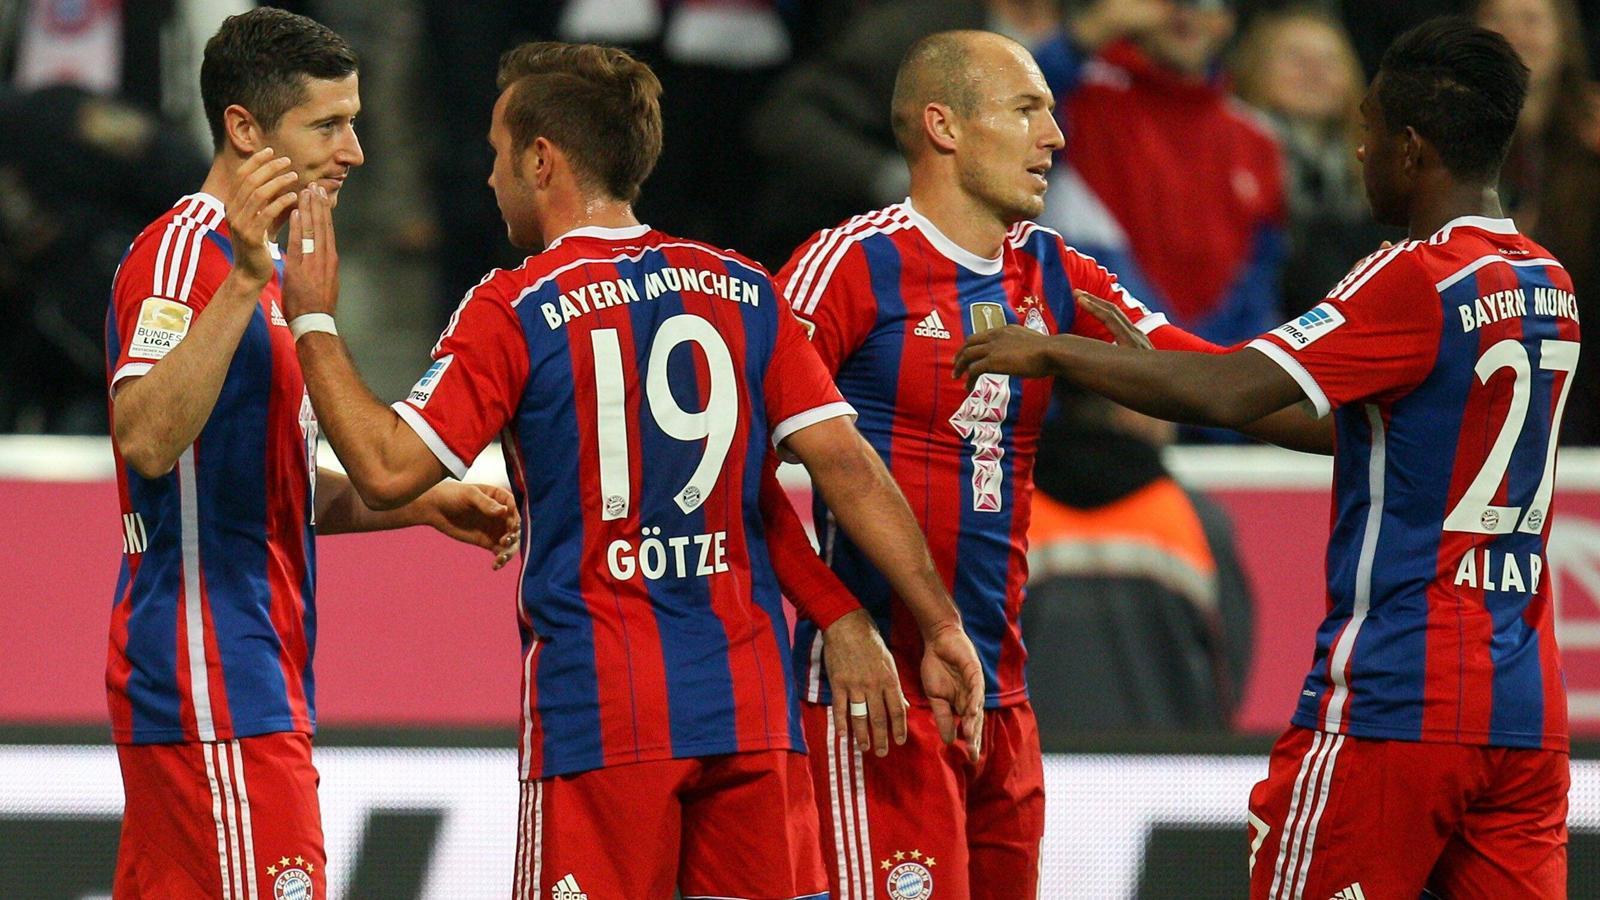 Prediksi Bola Bayern Munchen Vs Koln l Prediksi Bola Terpercaya